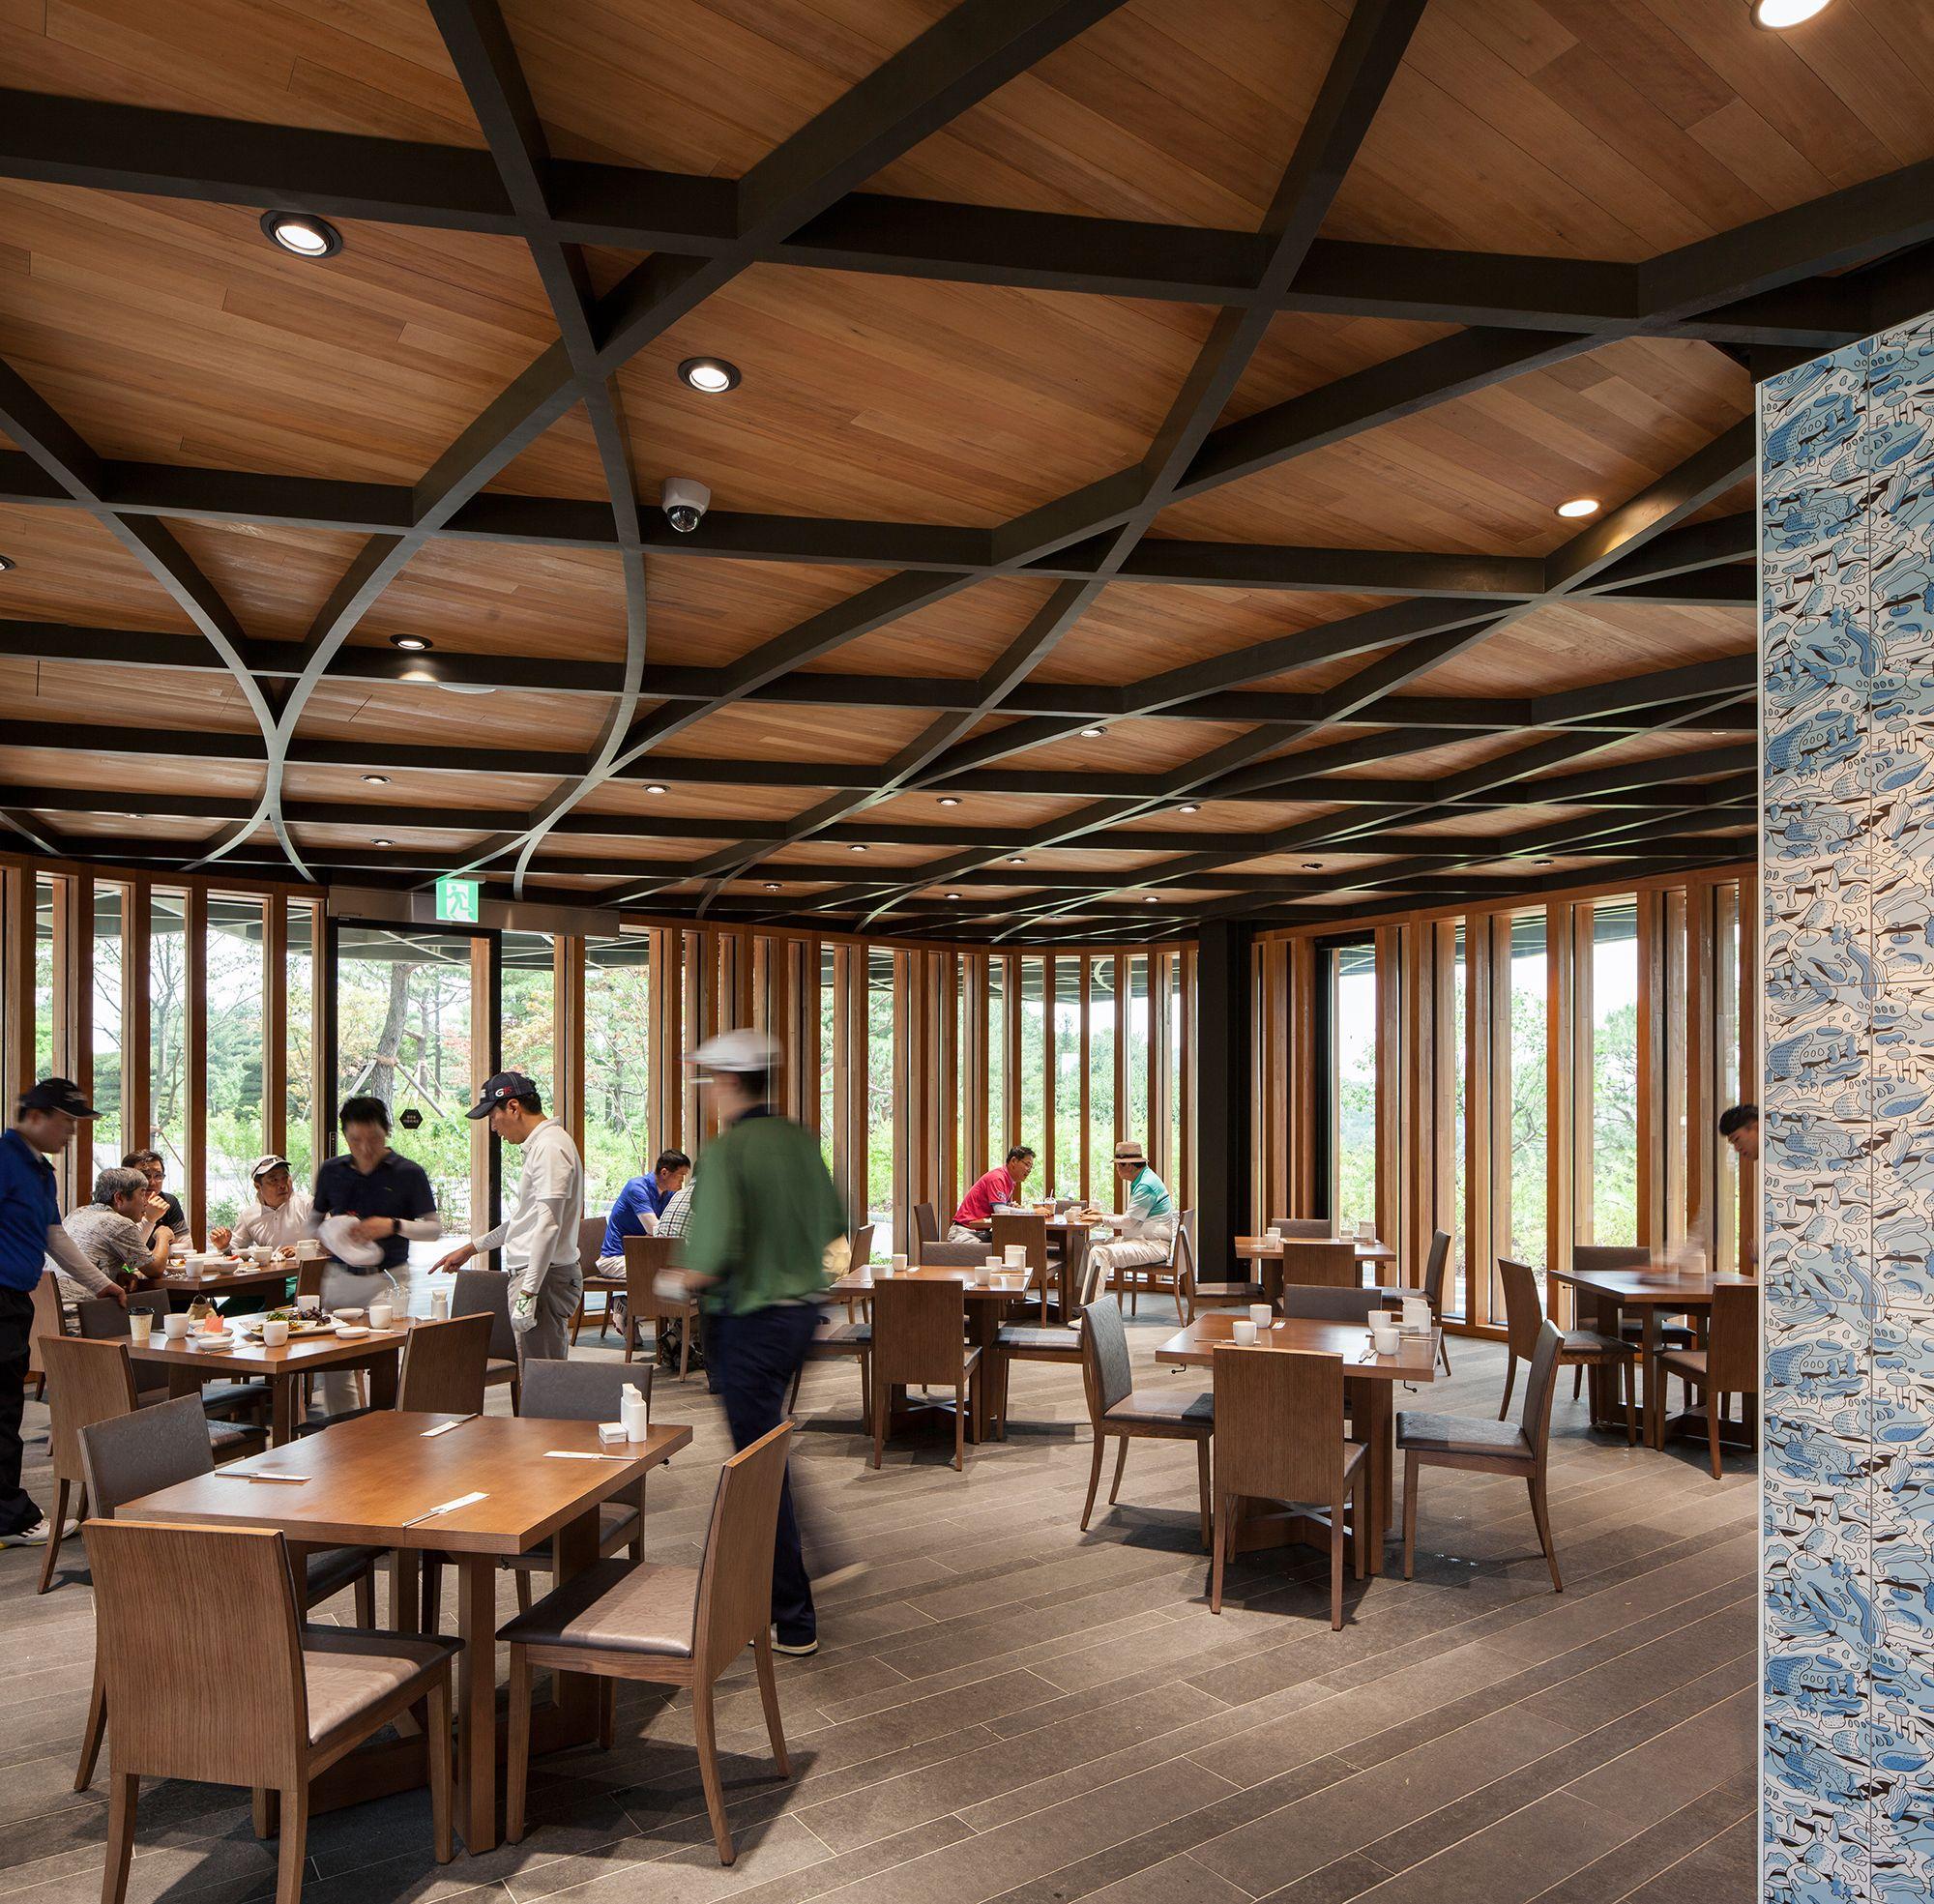 Mecanoo Architects, Taekwang Country Club Café, Gyeonggi-do, Fotograf: Harry Cock